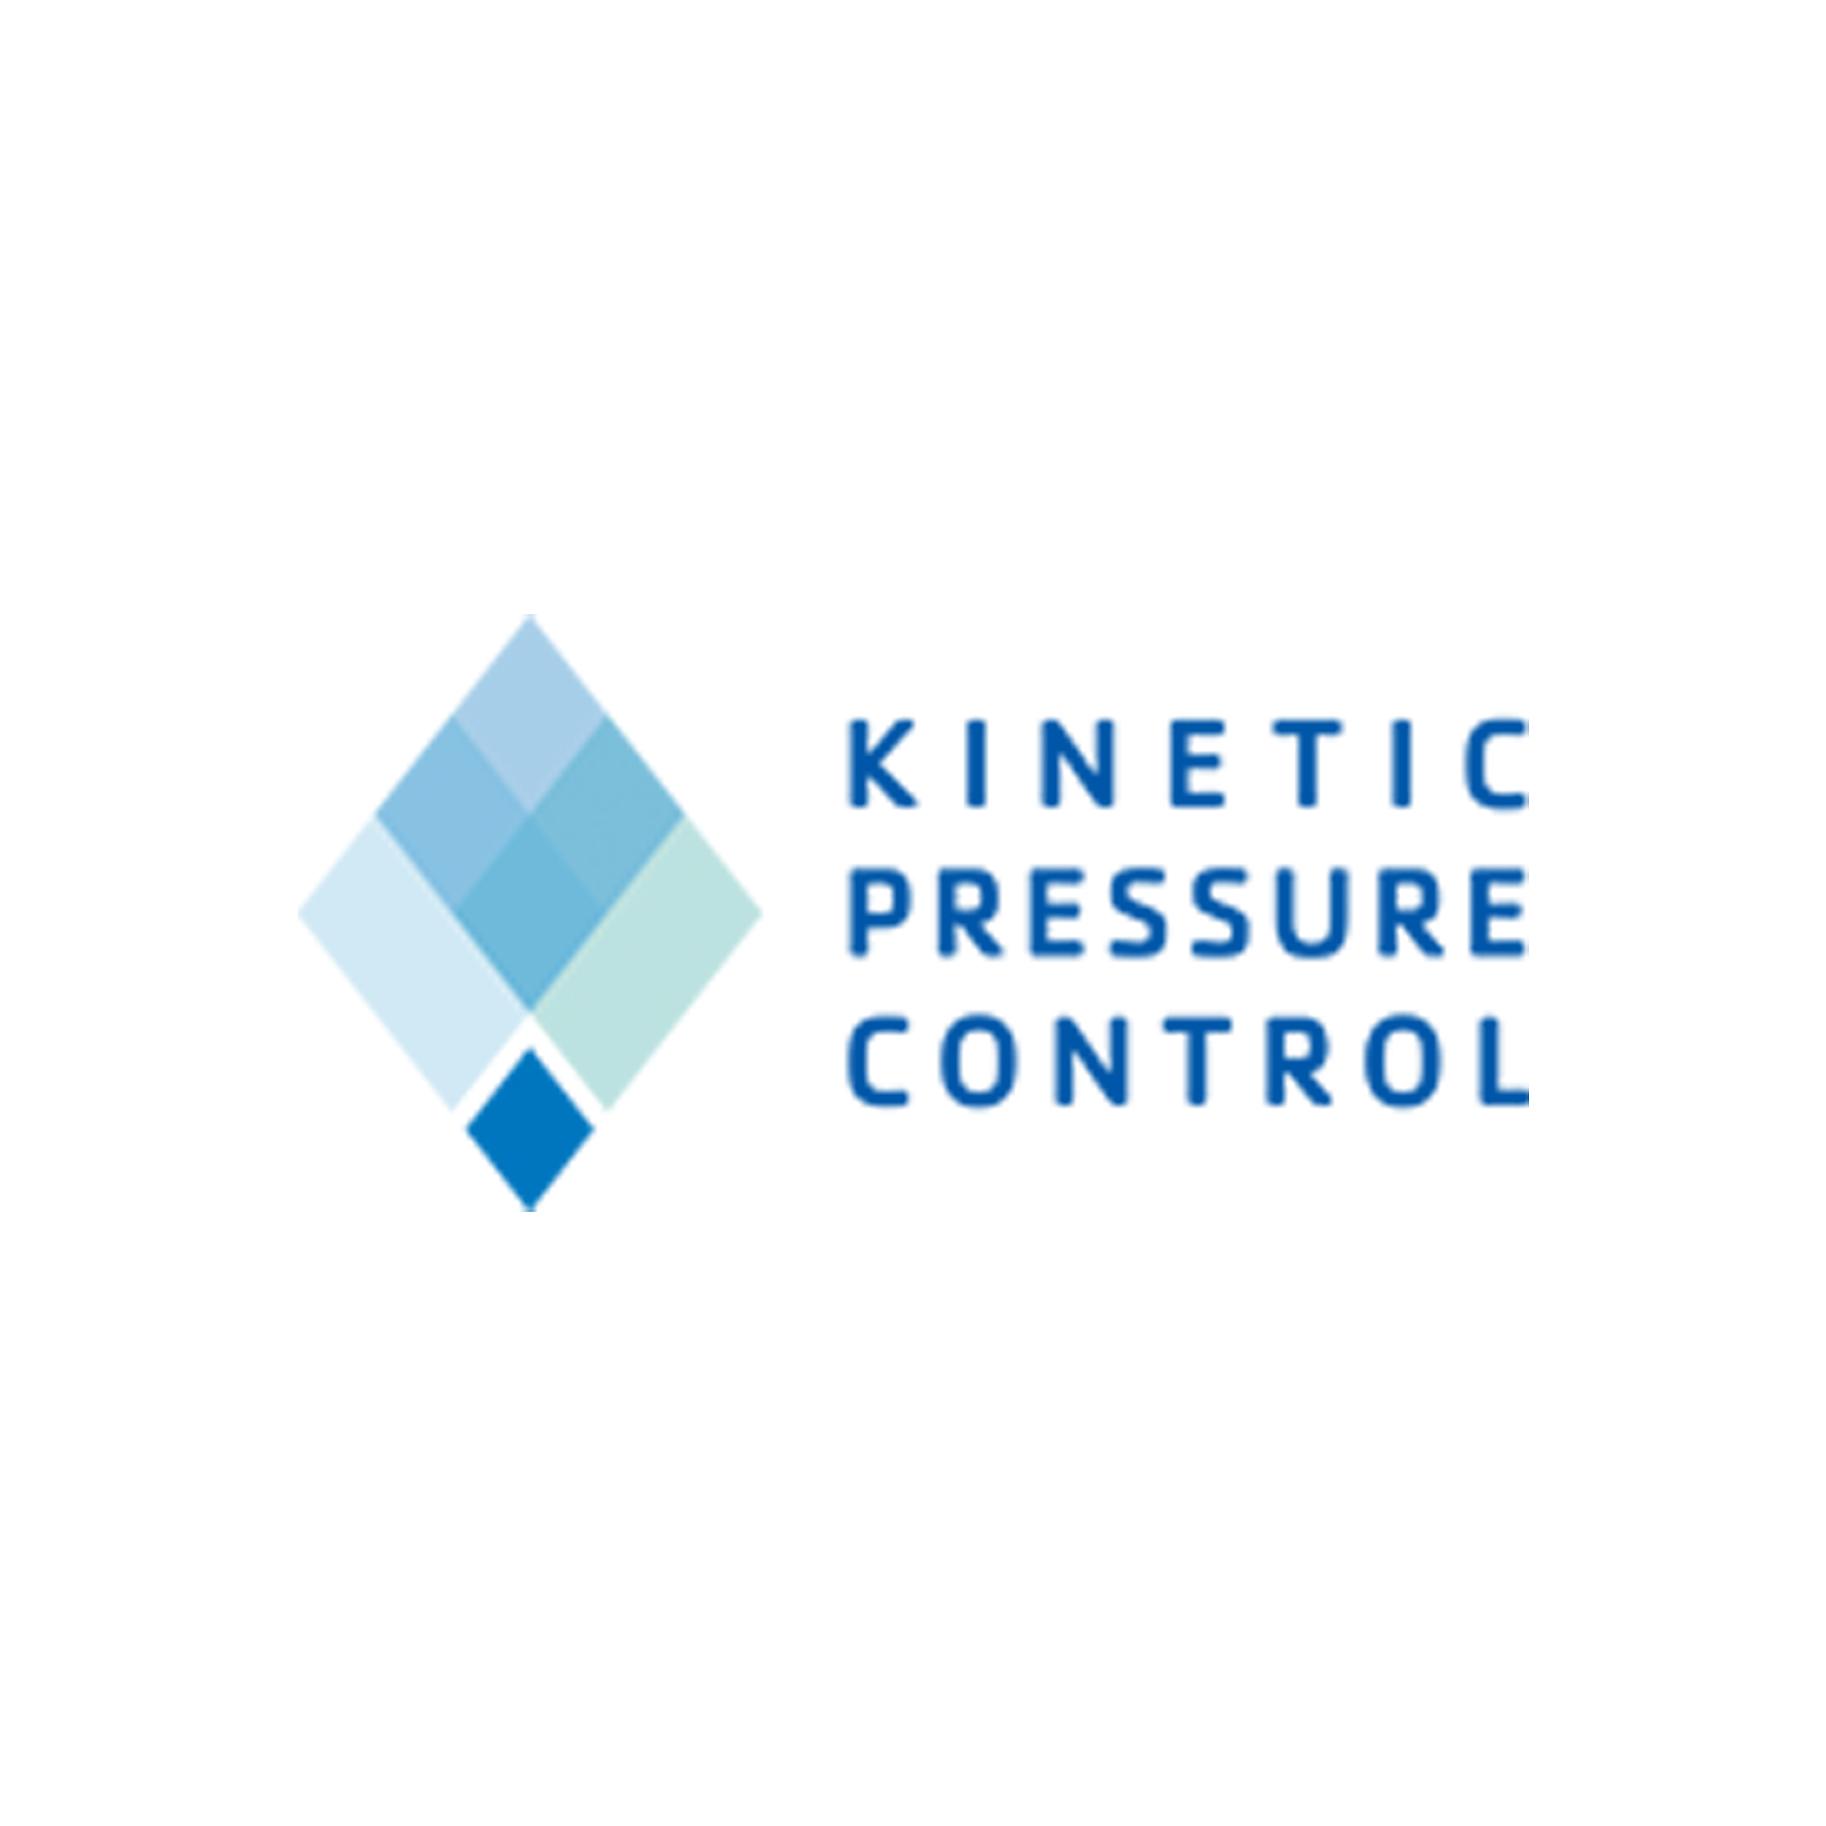 Kinetic-Pressure-Control.jpg